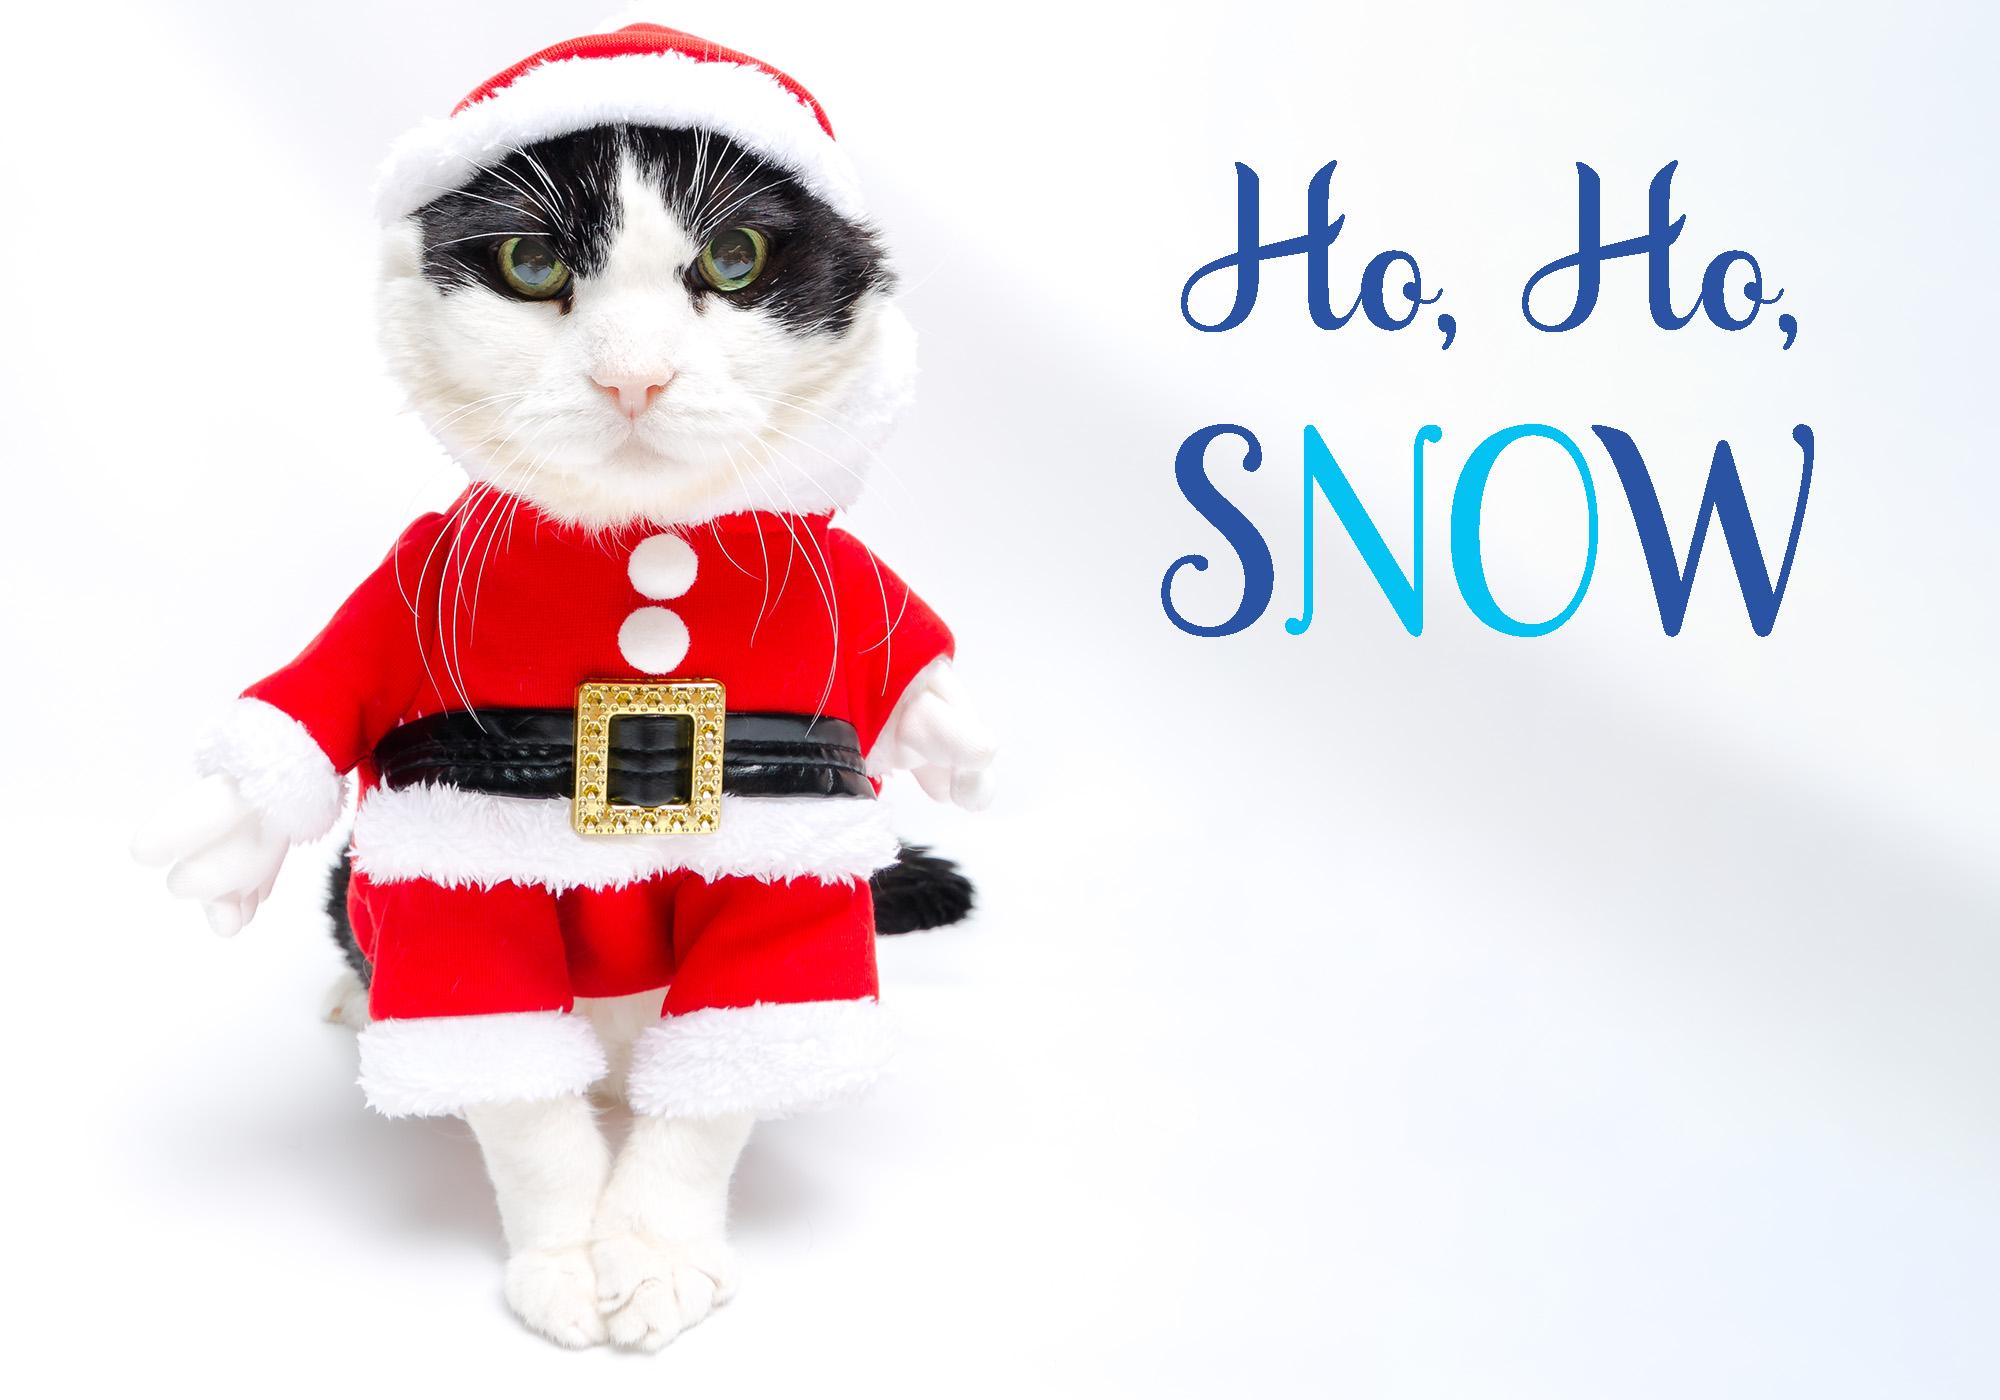 1_Cat_Santa_Outfit_meme.jpg